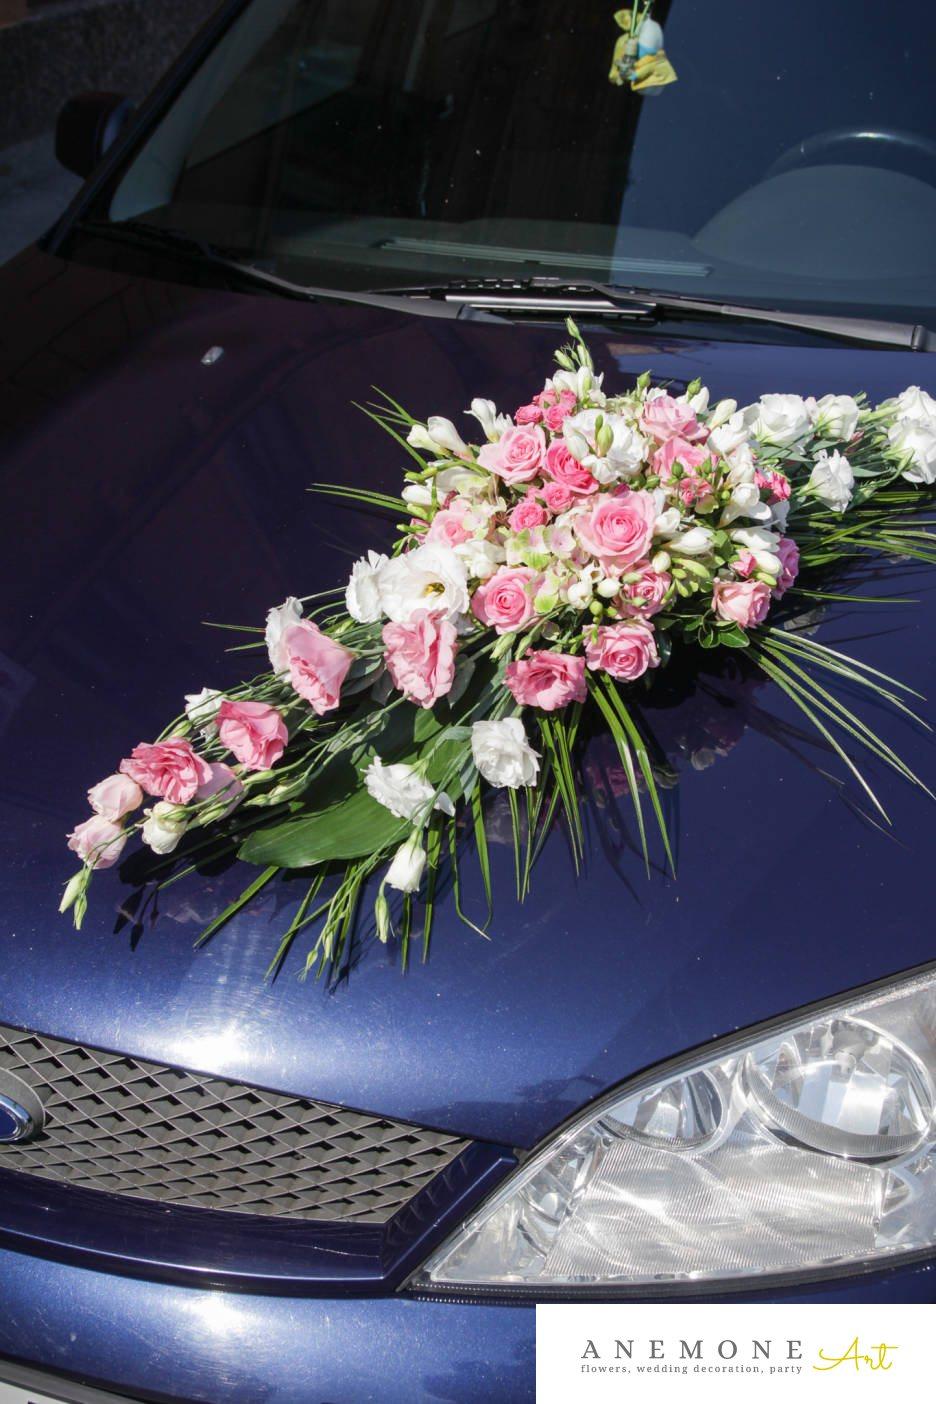 Poza, foto cu Flori de nunta alb, asimetric, decor masina, lisianthus, roz, trandafiri in Arad, Timisoara, Oradea (wedding flowers, bouquets) nunta Arad, Timisoara, Oradea